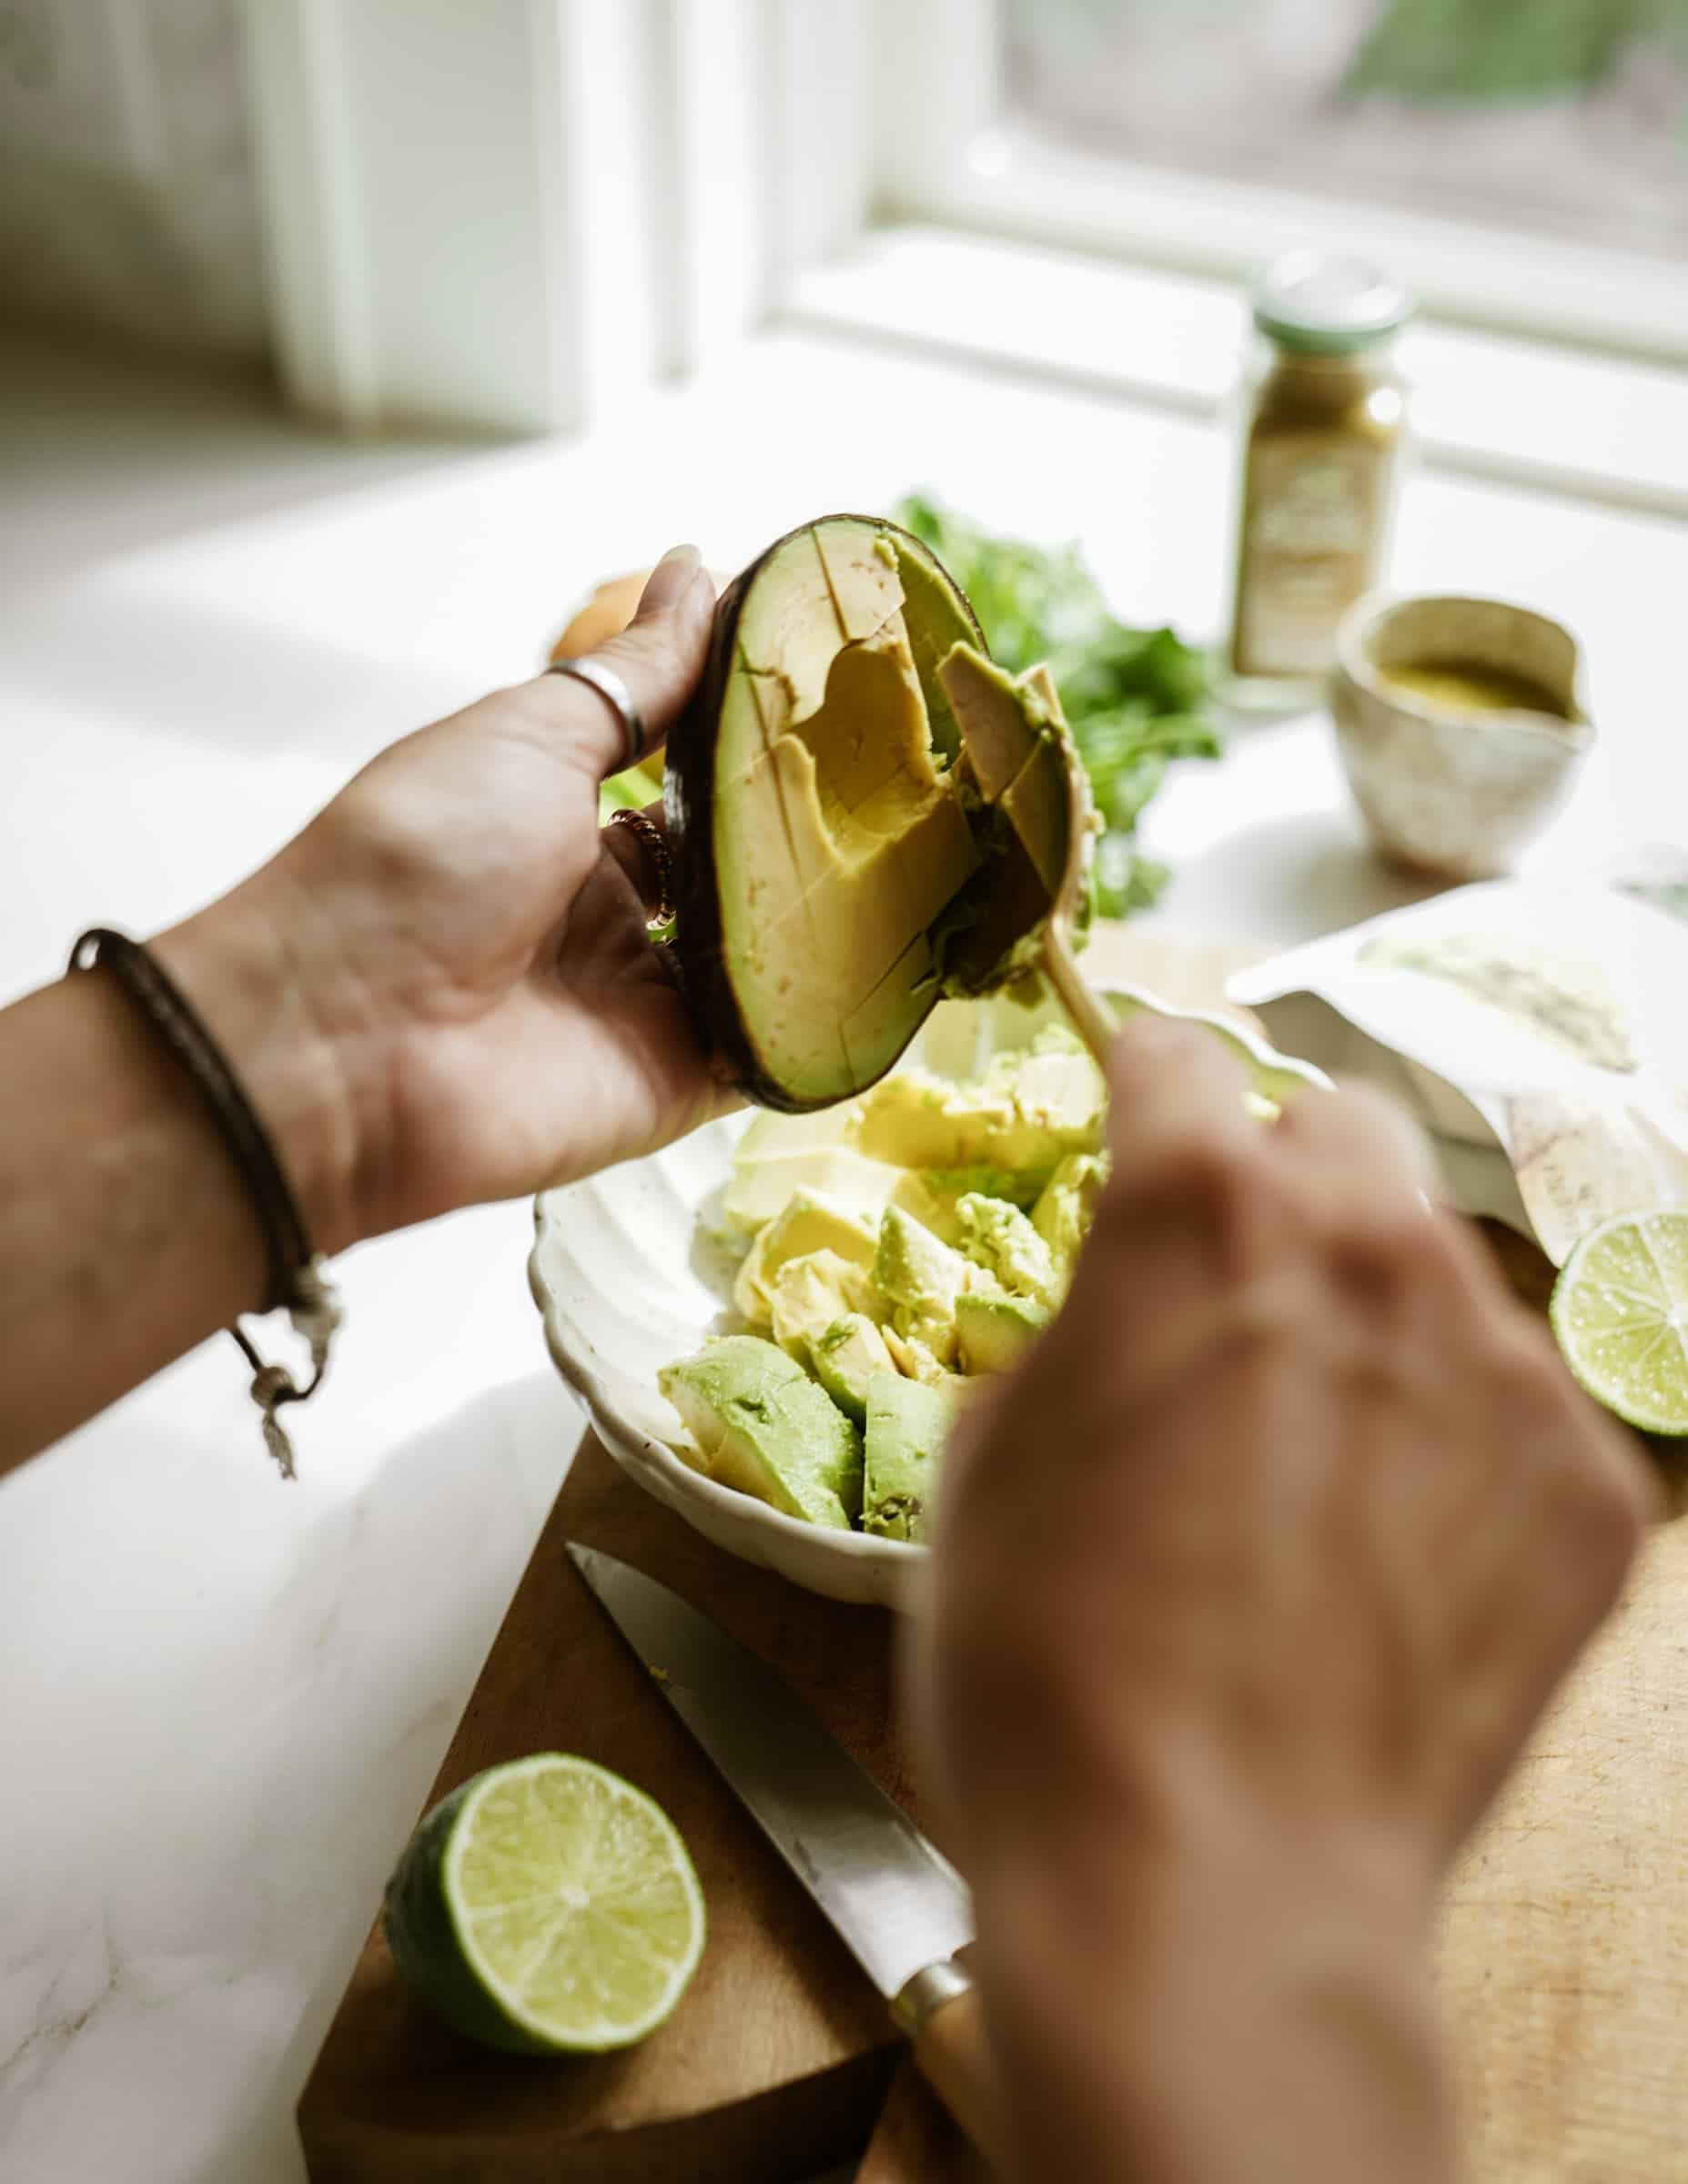 Scooping avocado out of a avocado